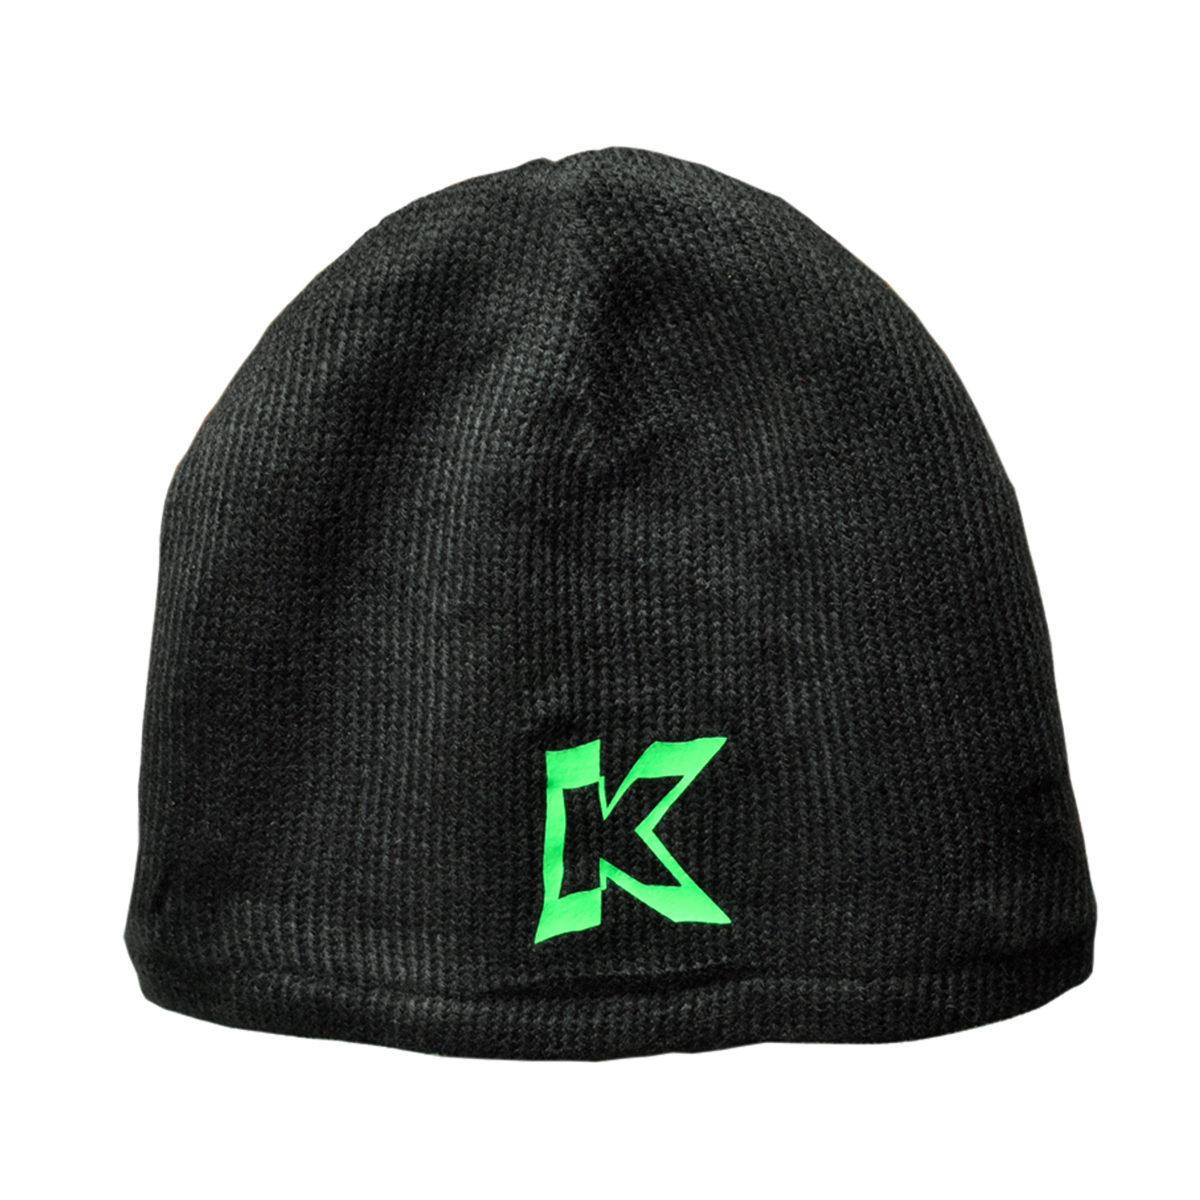 kishels scents black beanie hat